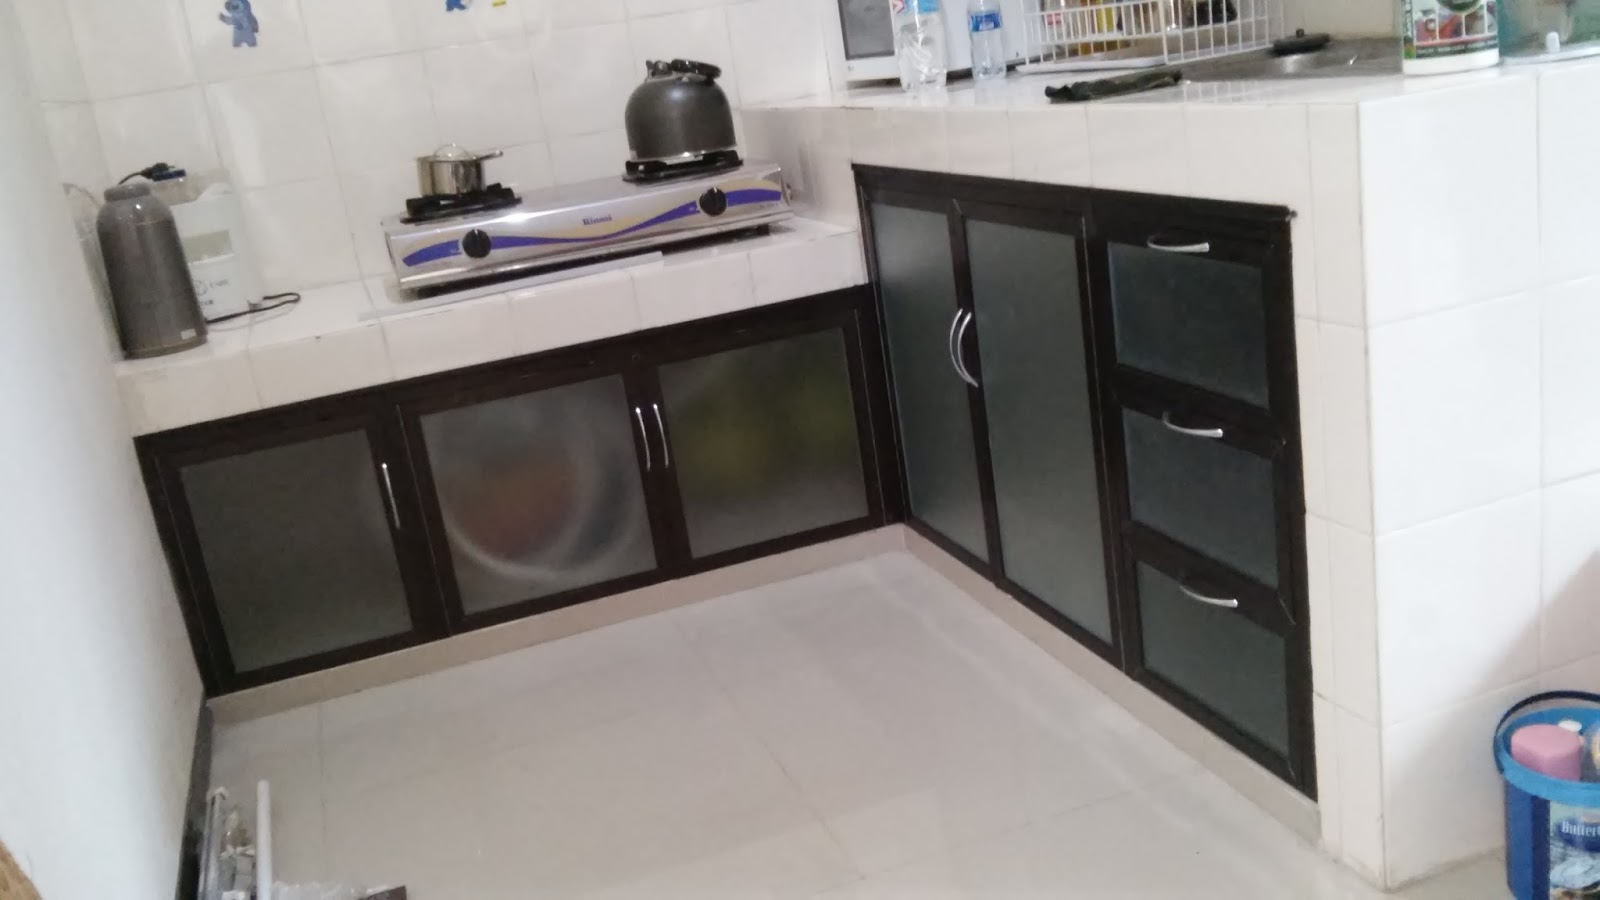 Laris Pro Alumunium Kaca Surabaya Kitchen Set Alumunium